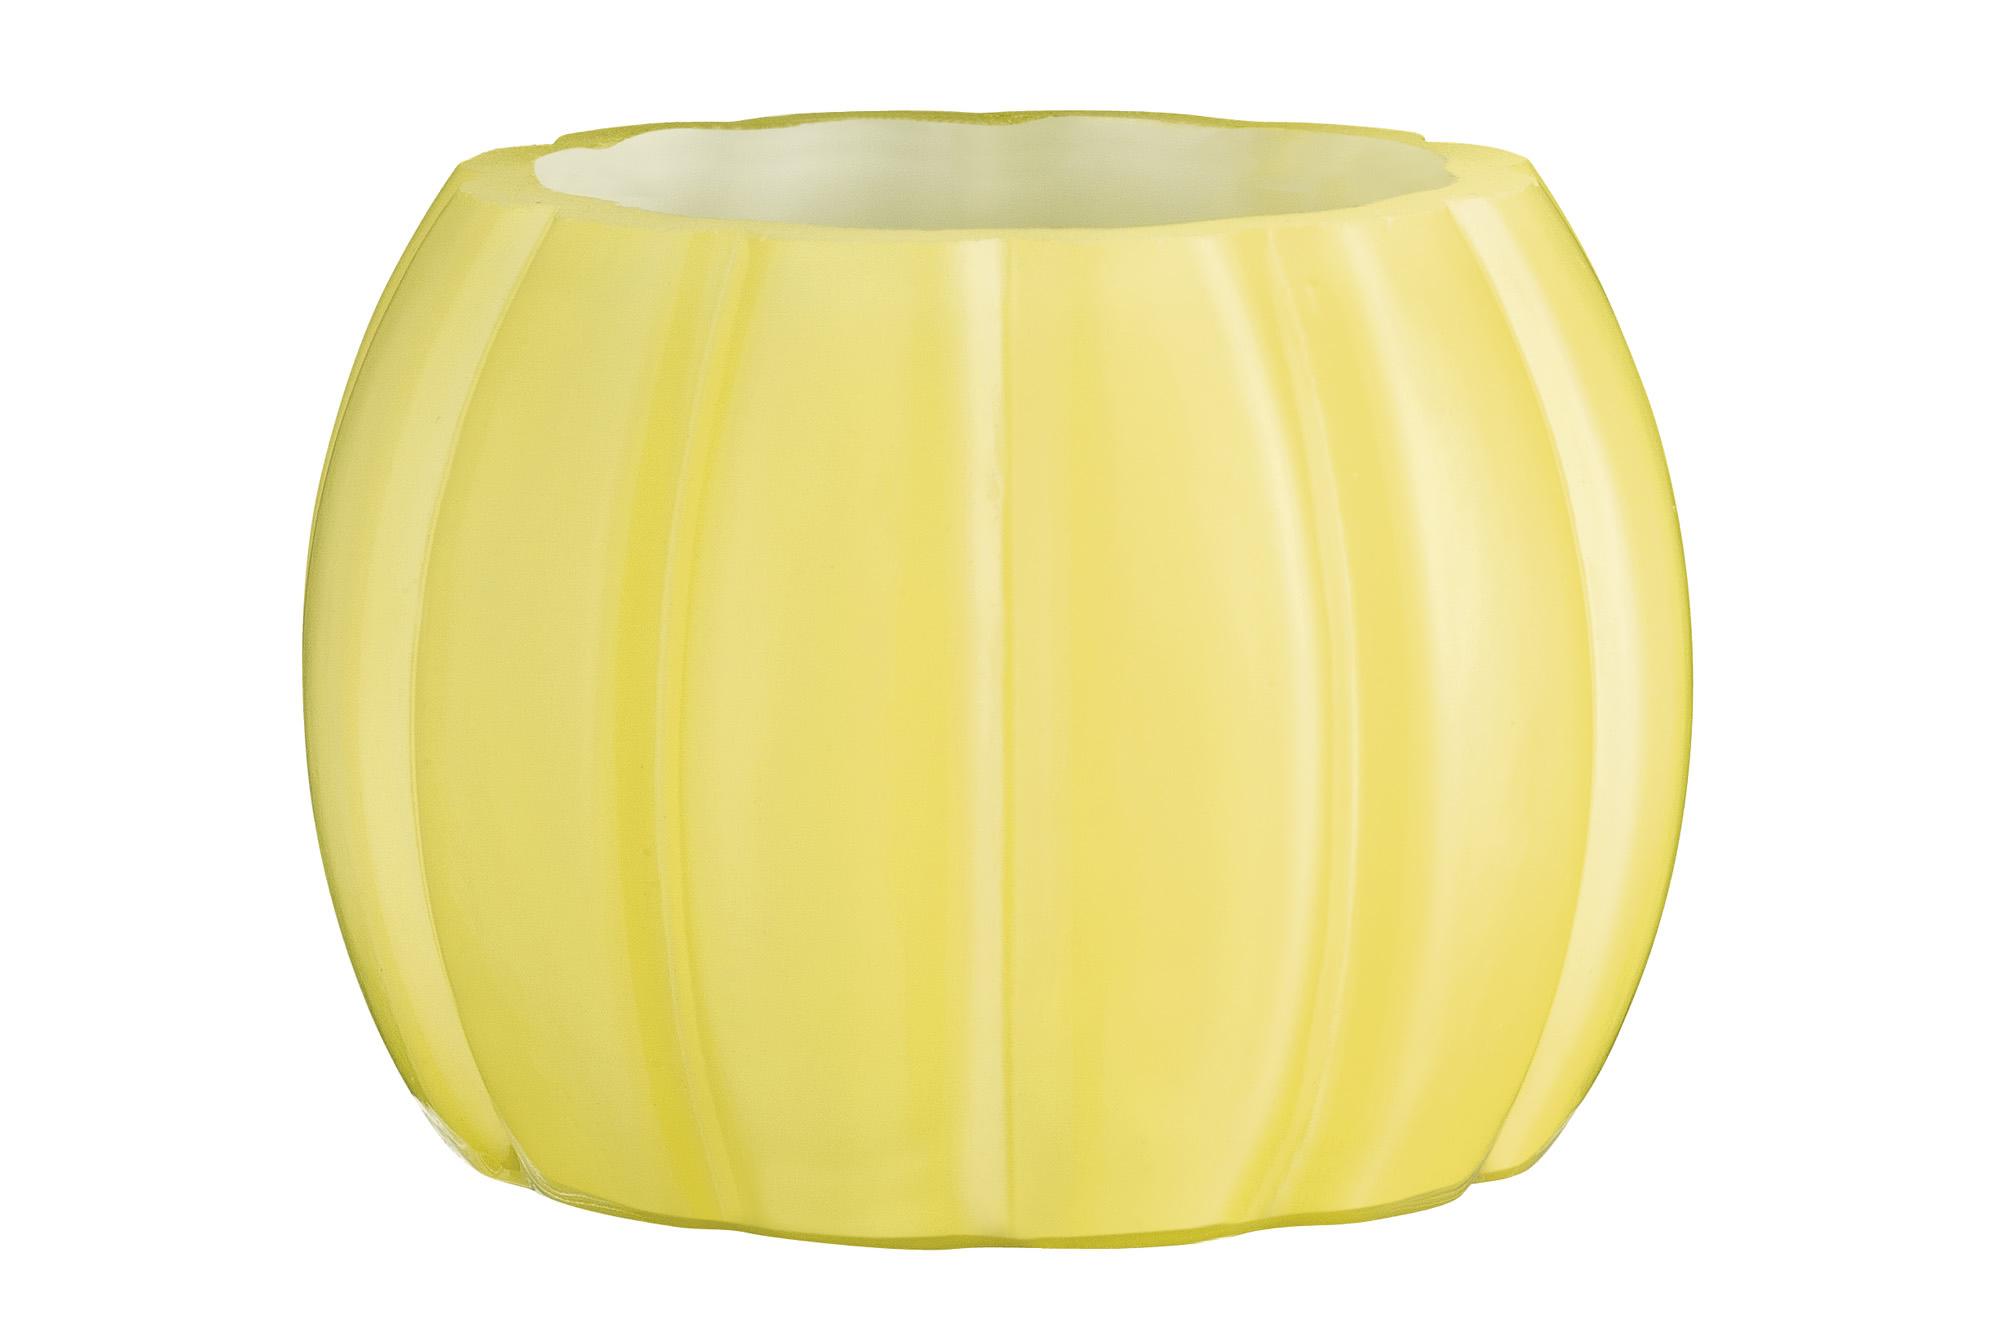 Paulmann. 60107 Плафон для Living 2Easy MyLED Glas Cara, желтый